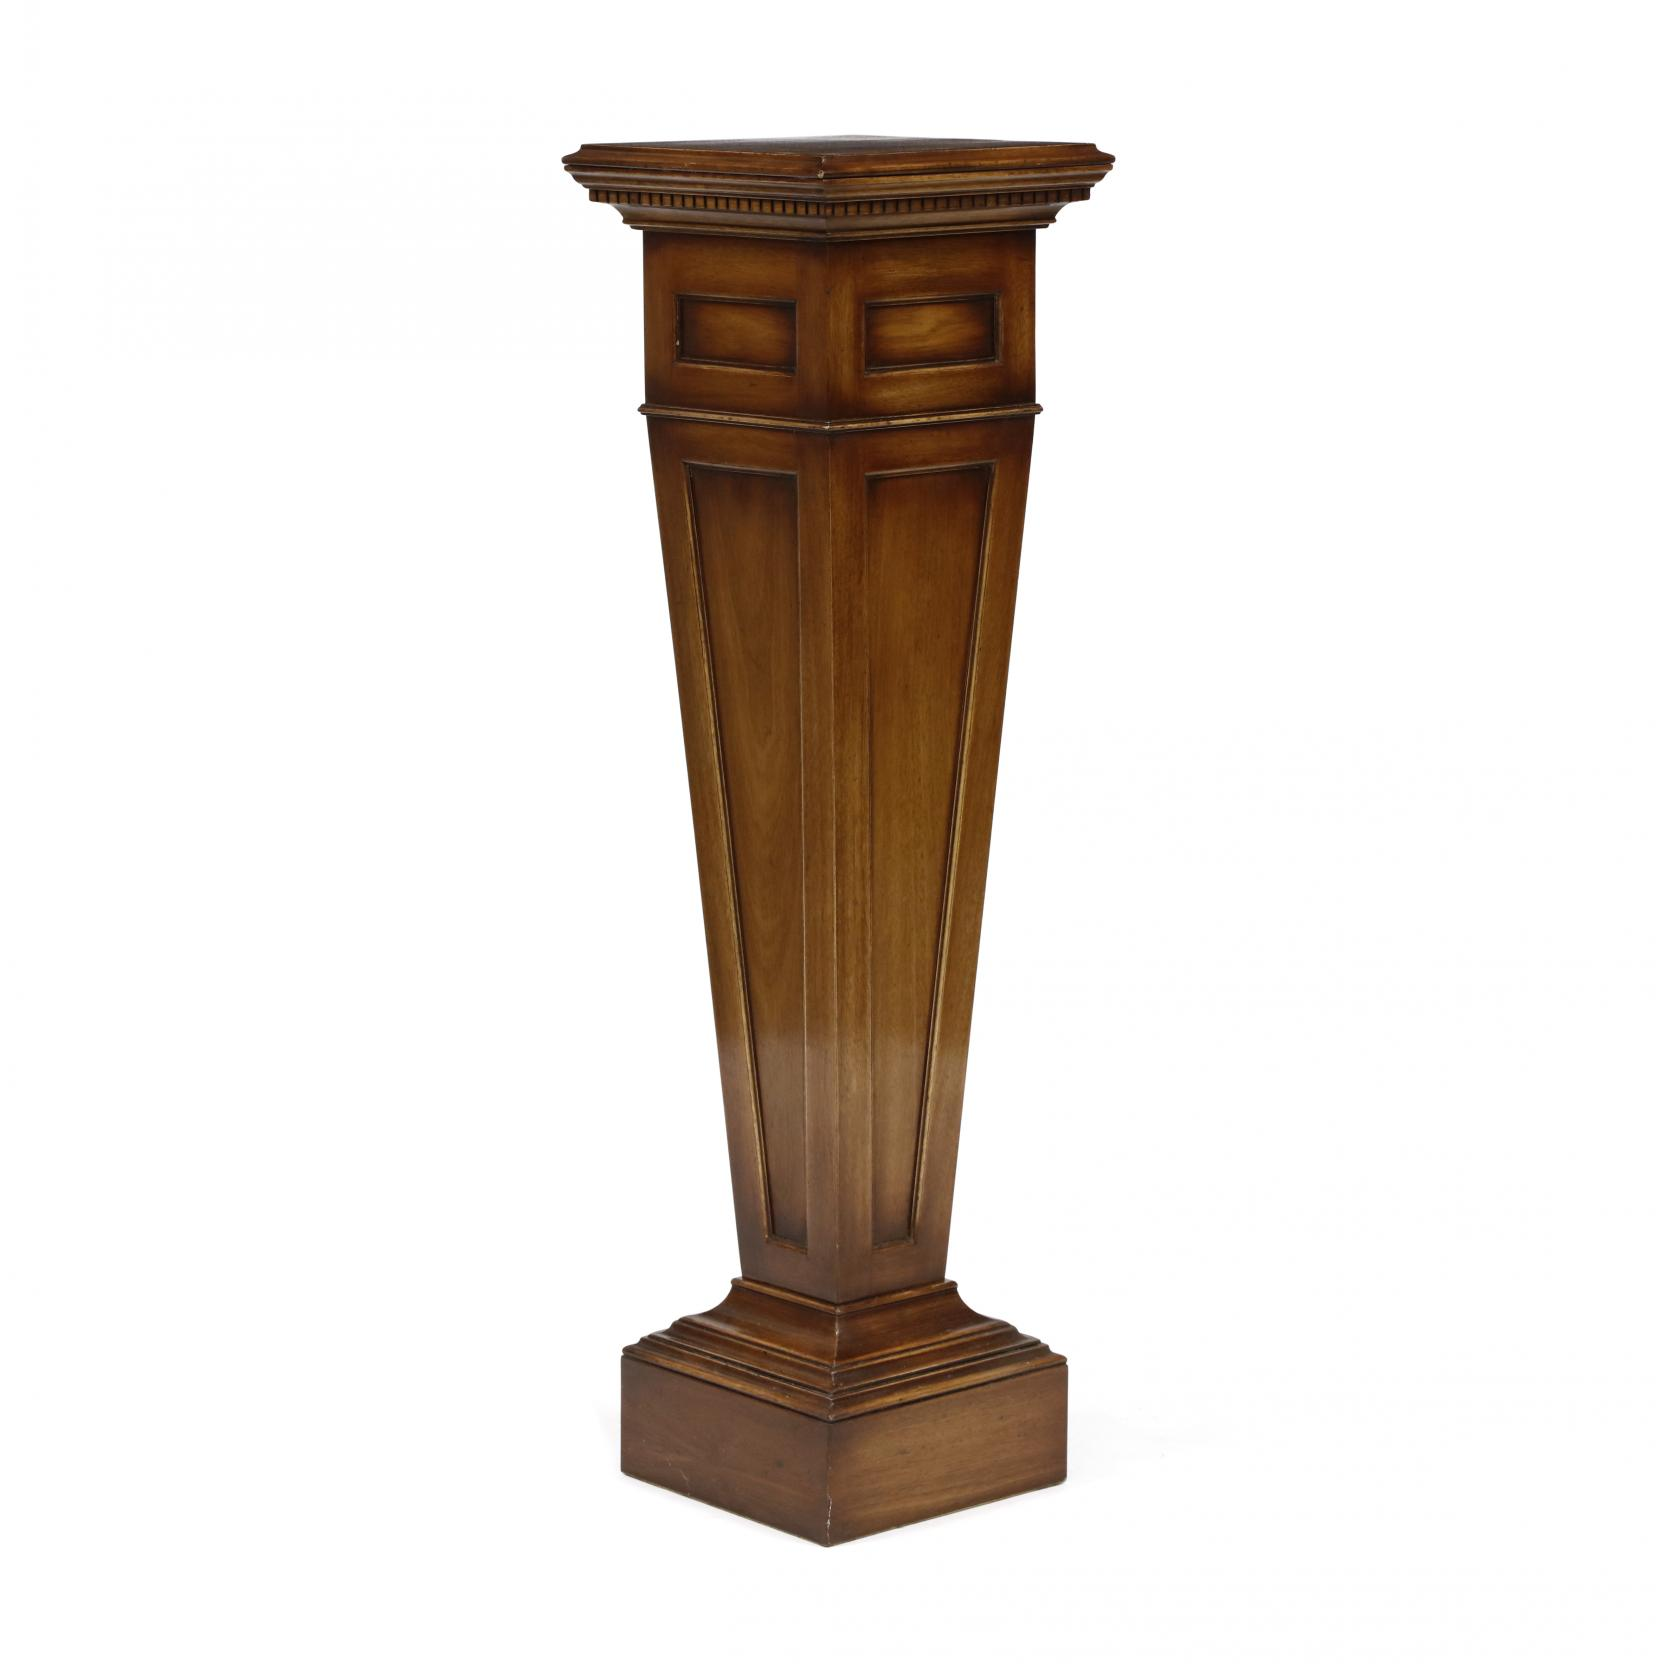 georgian-style-mahogany-pedestal